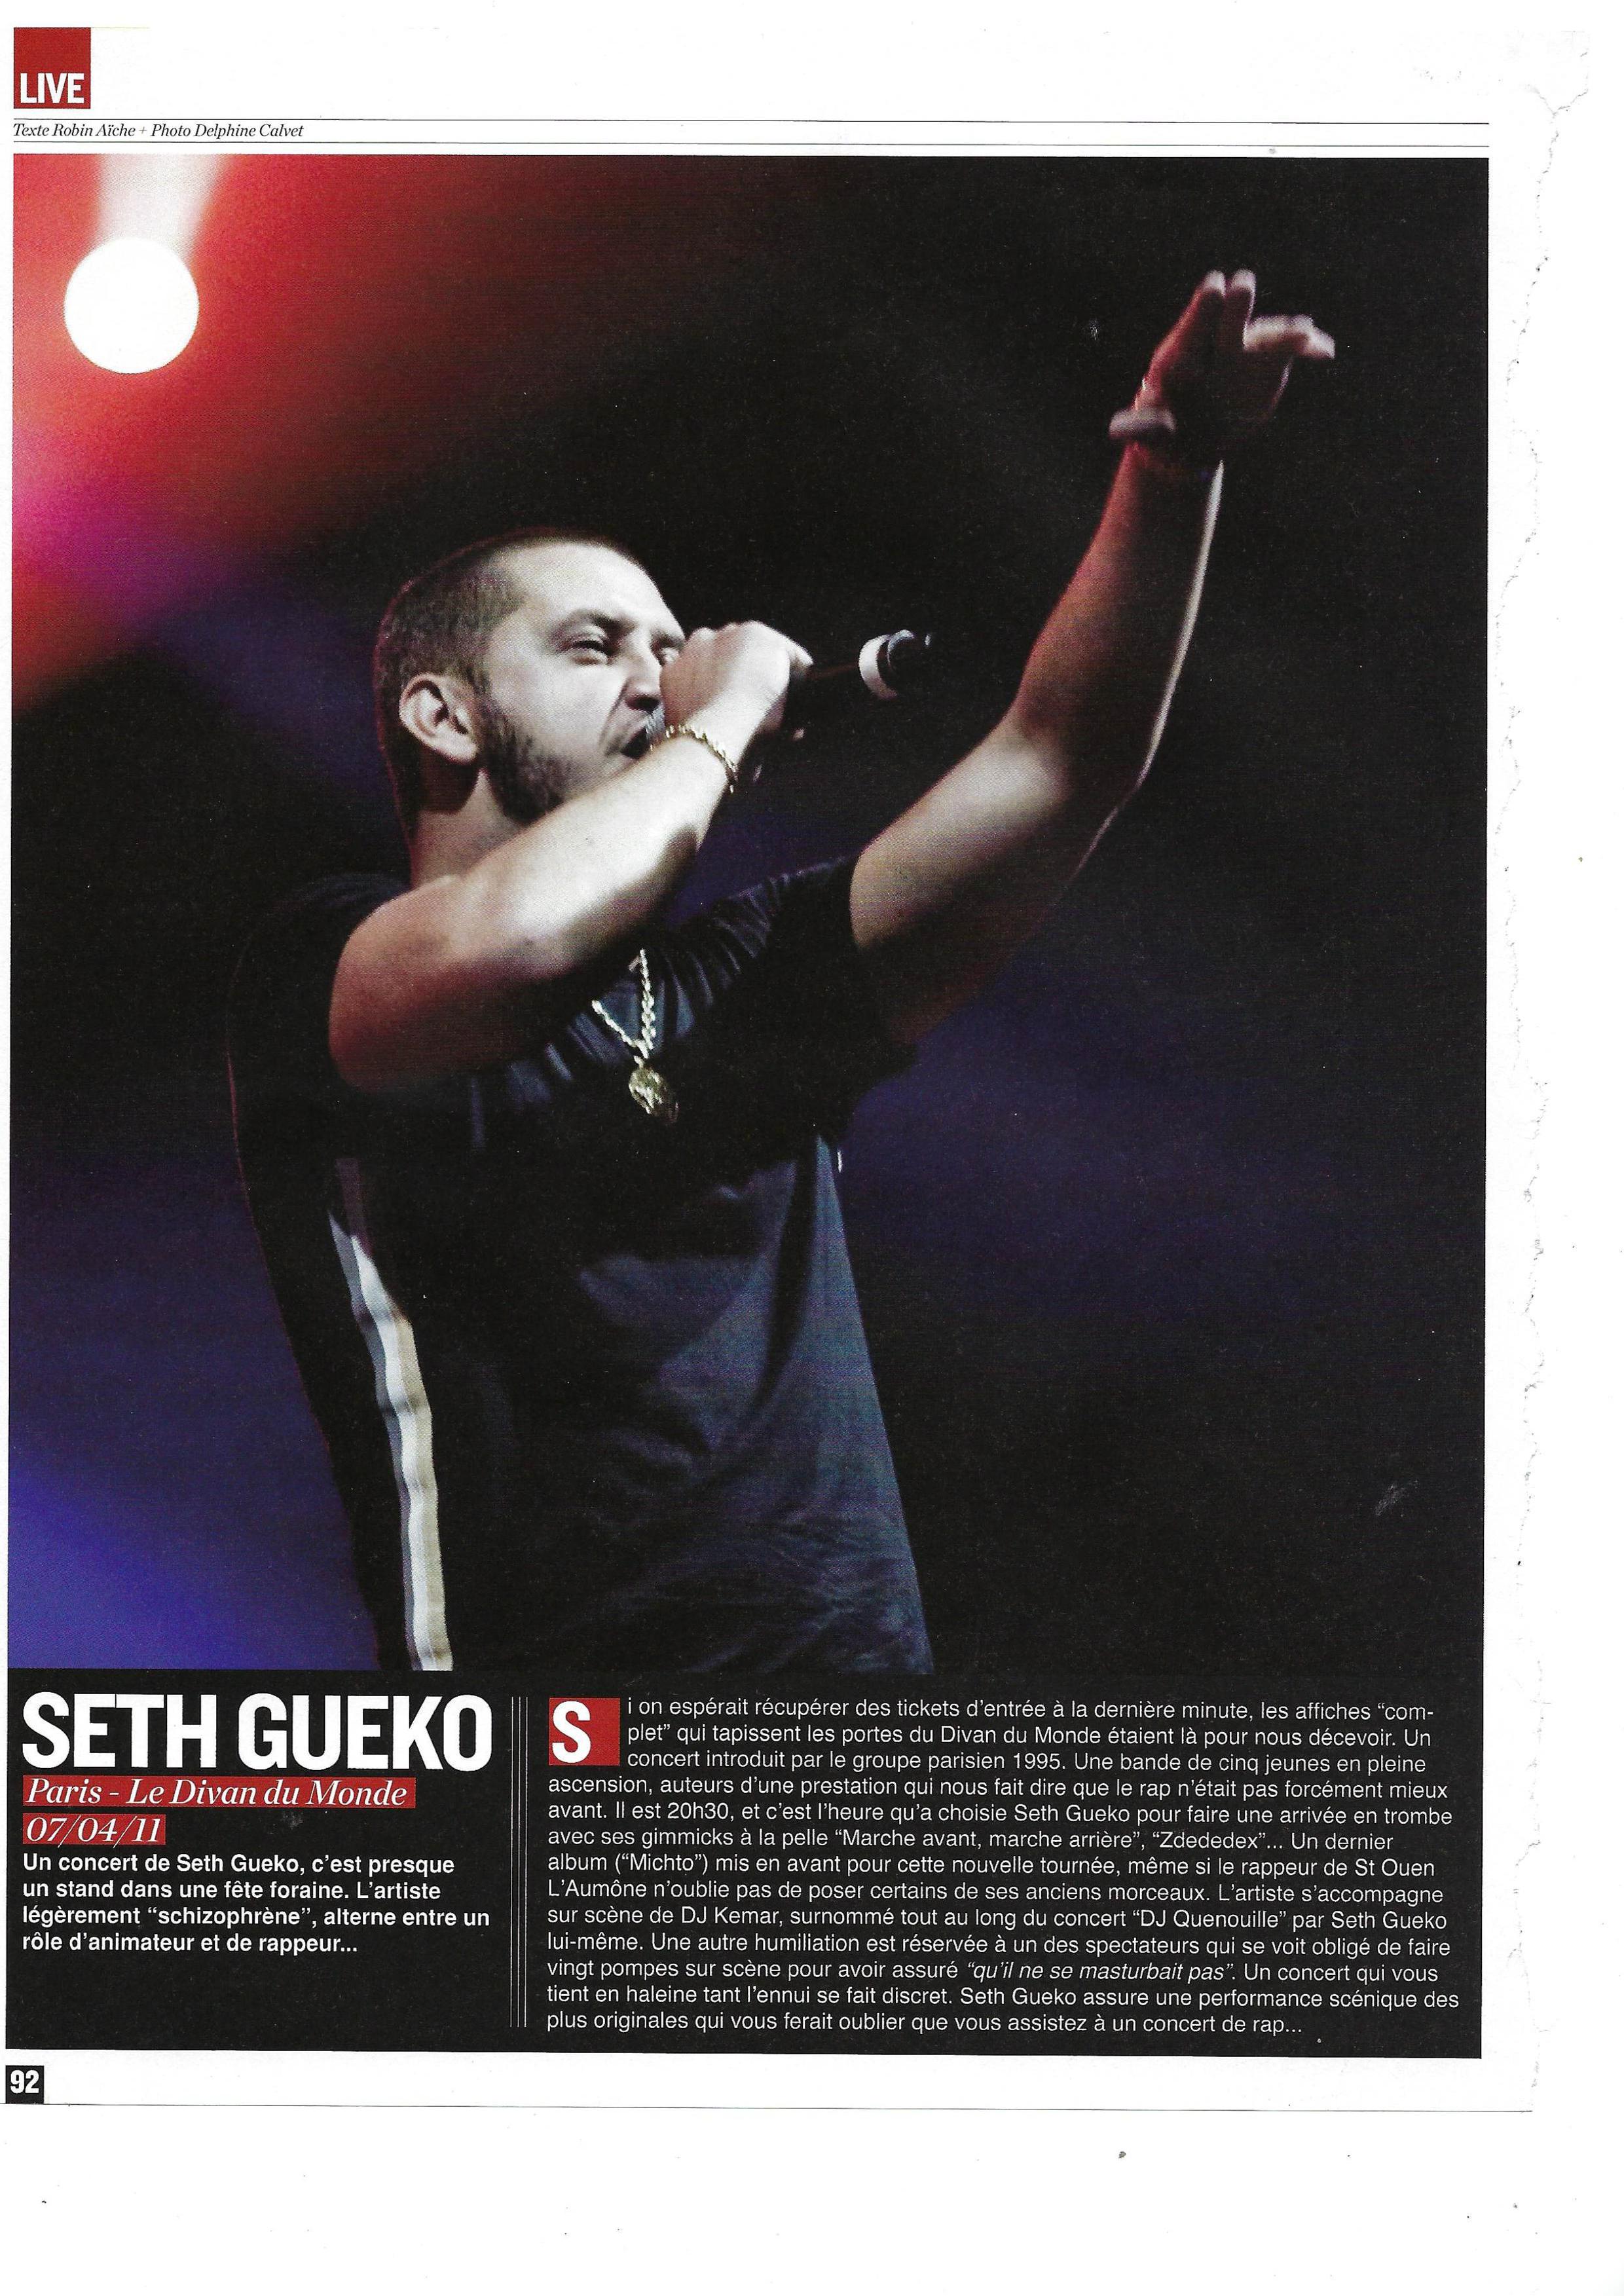 Seth Gueko (Rap Mag)